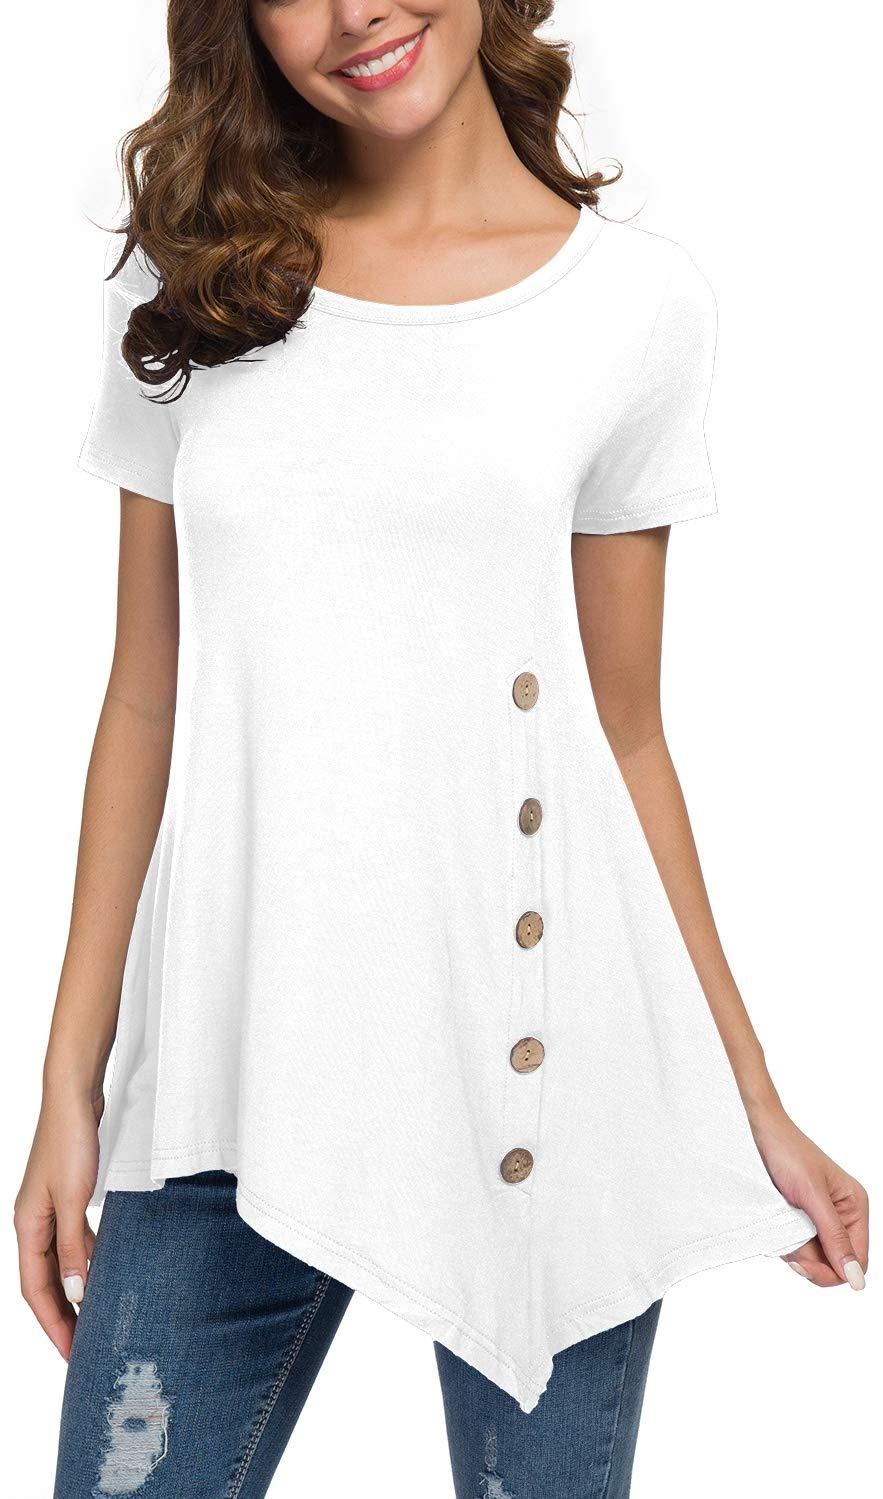 VIISHOW Women's Short Sleeve Scoop Neck Button Side Tunic Tops Blouse